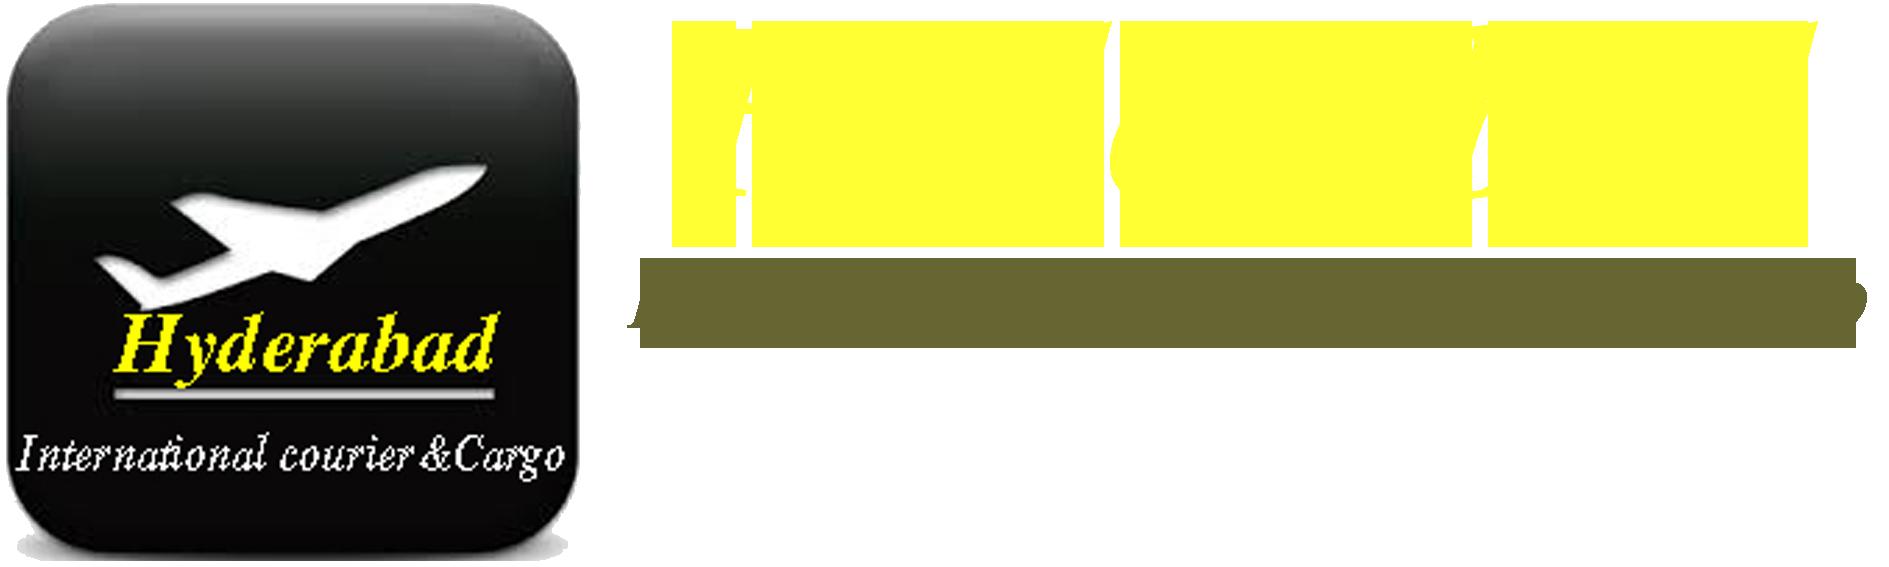 HYDERABAD TO SHARJAH,DUBAI,ABU DHABI FOOD-STUFF COURIER & CARGO